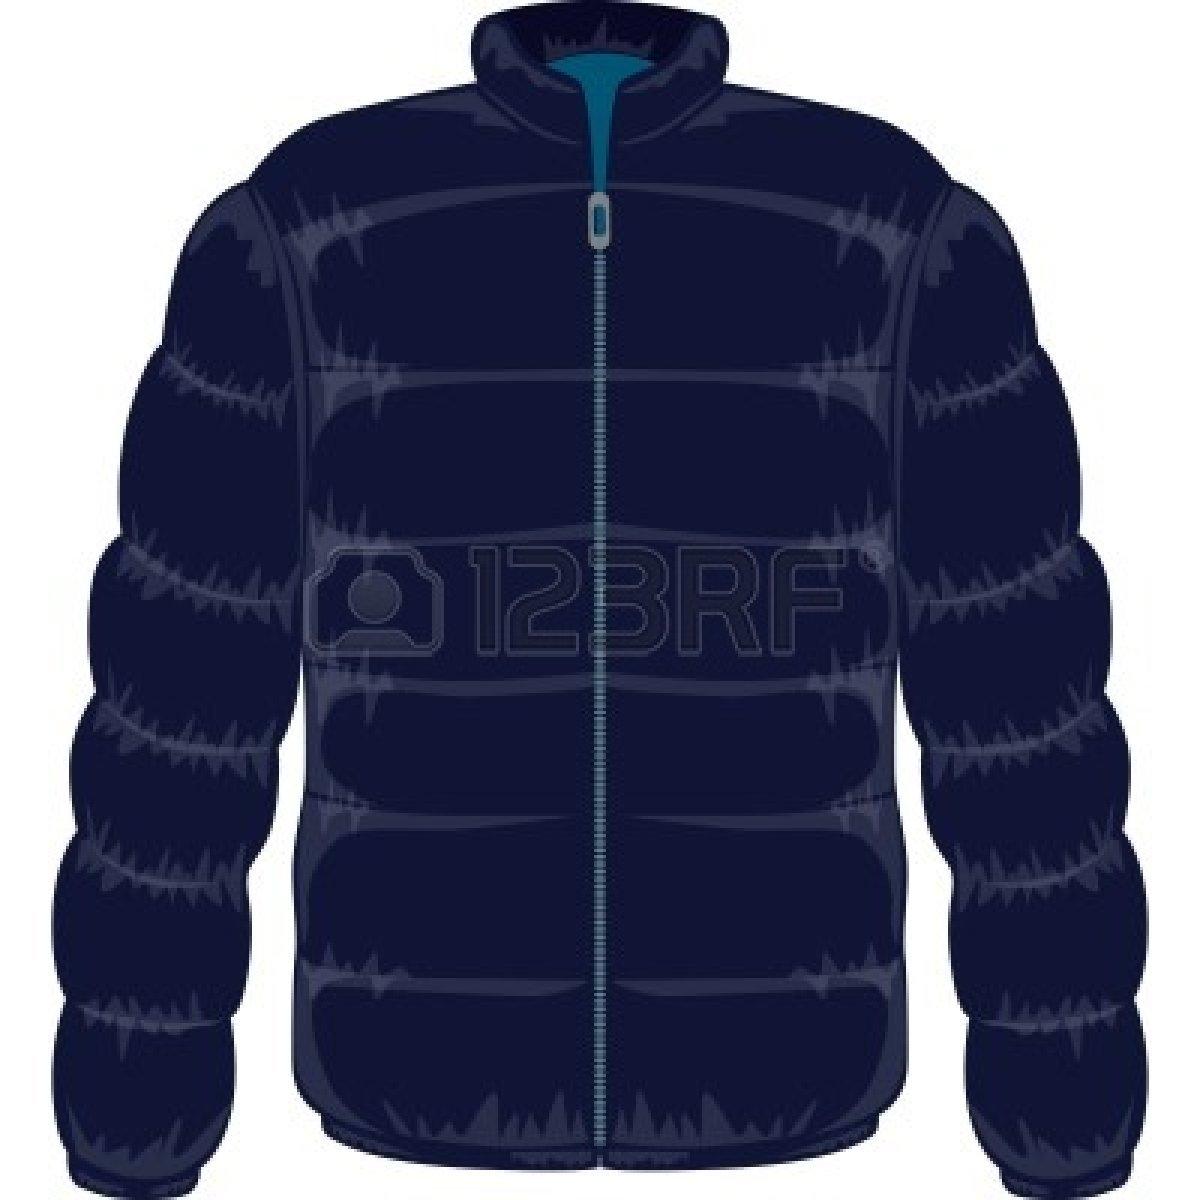 Snow jacket clipart 3 » Clipart Portal jpg download